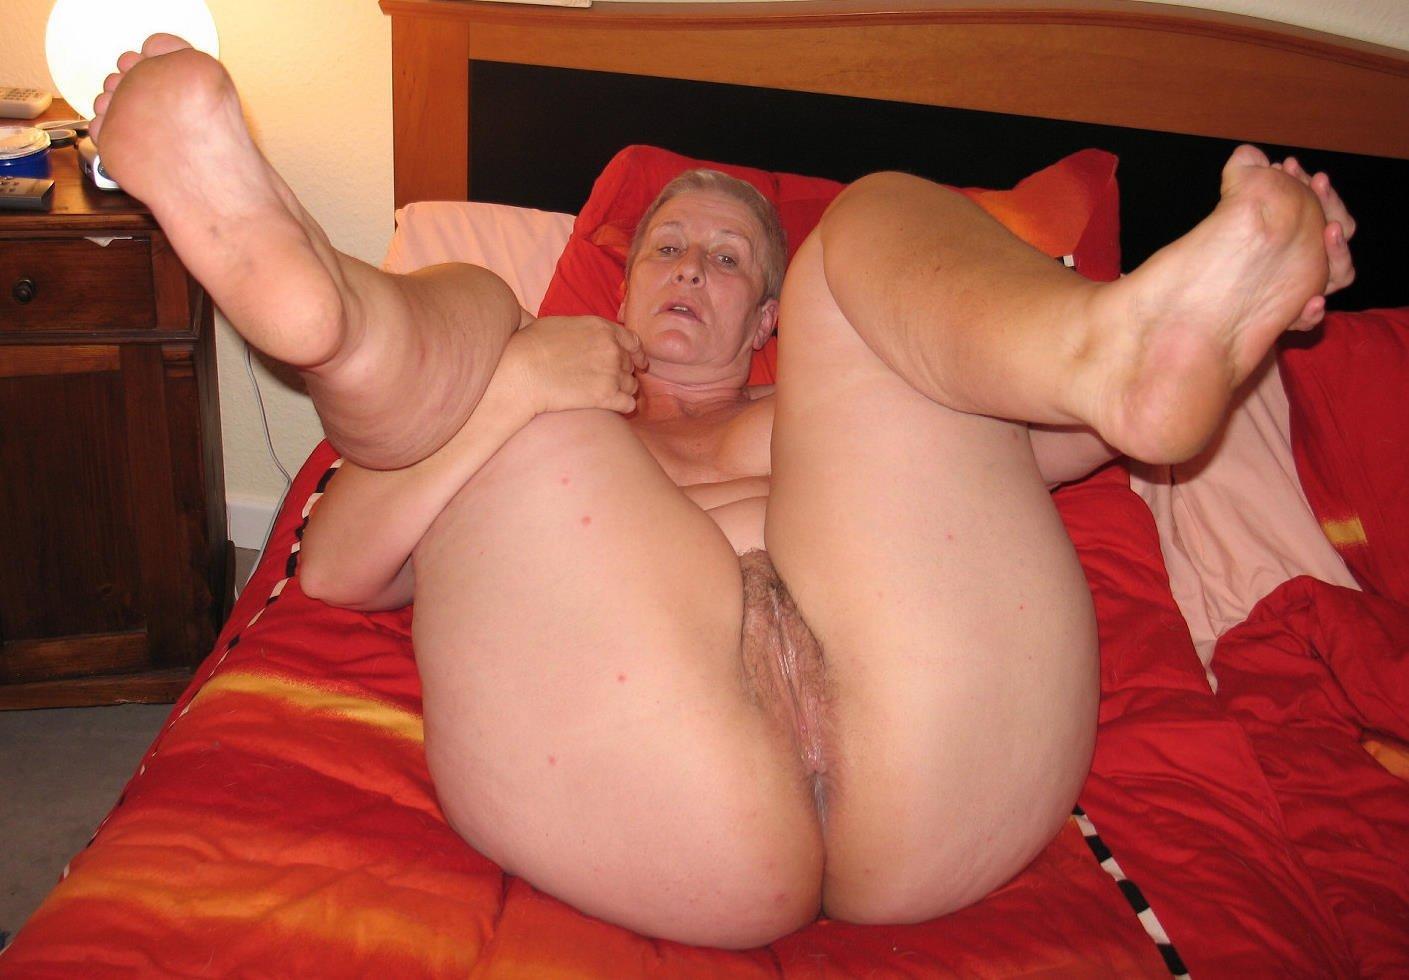 На Фото Голые Бабушки С Толстыми Жопами